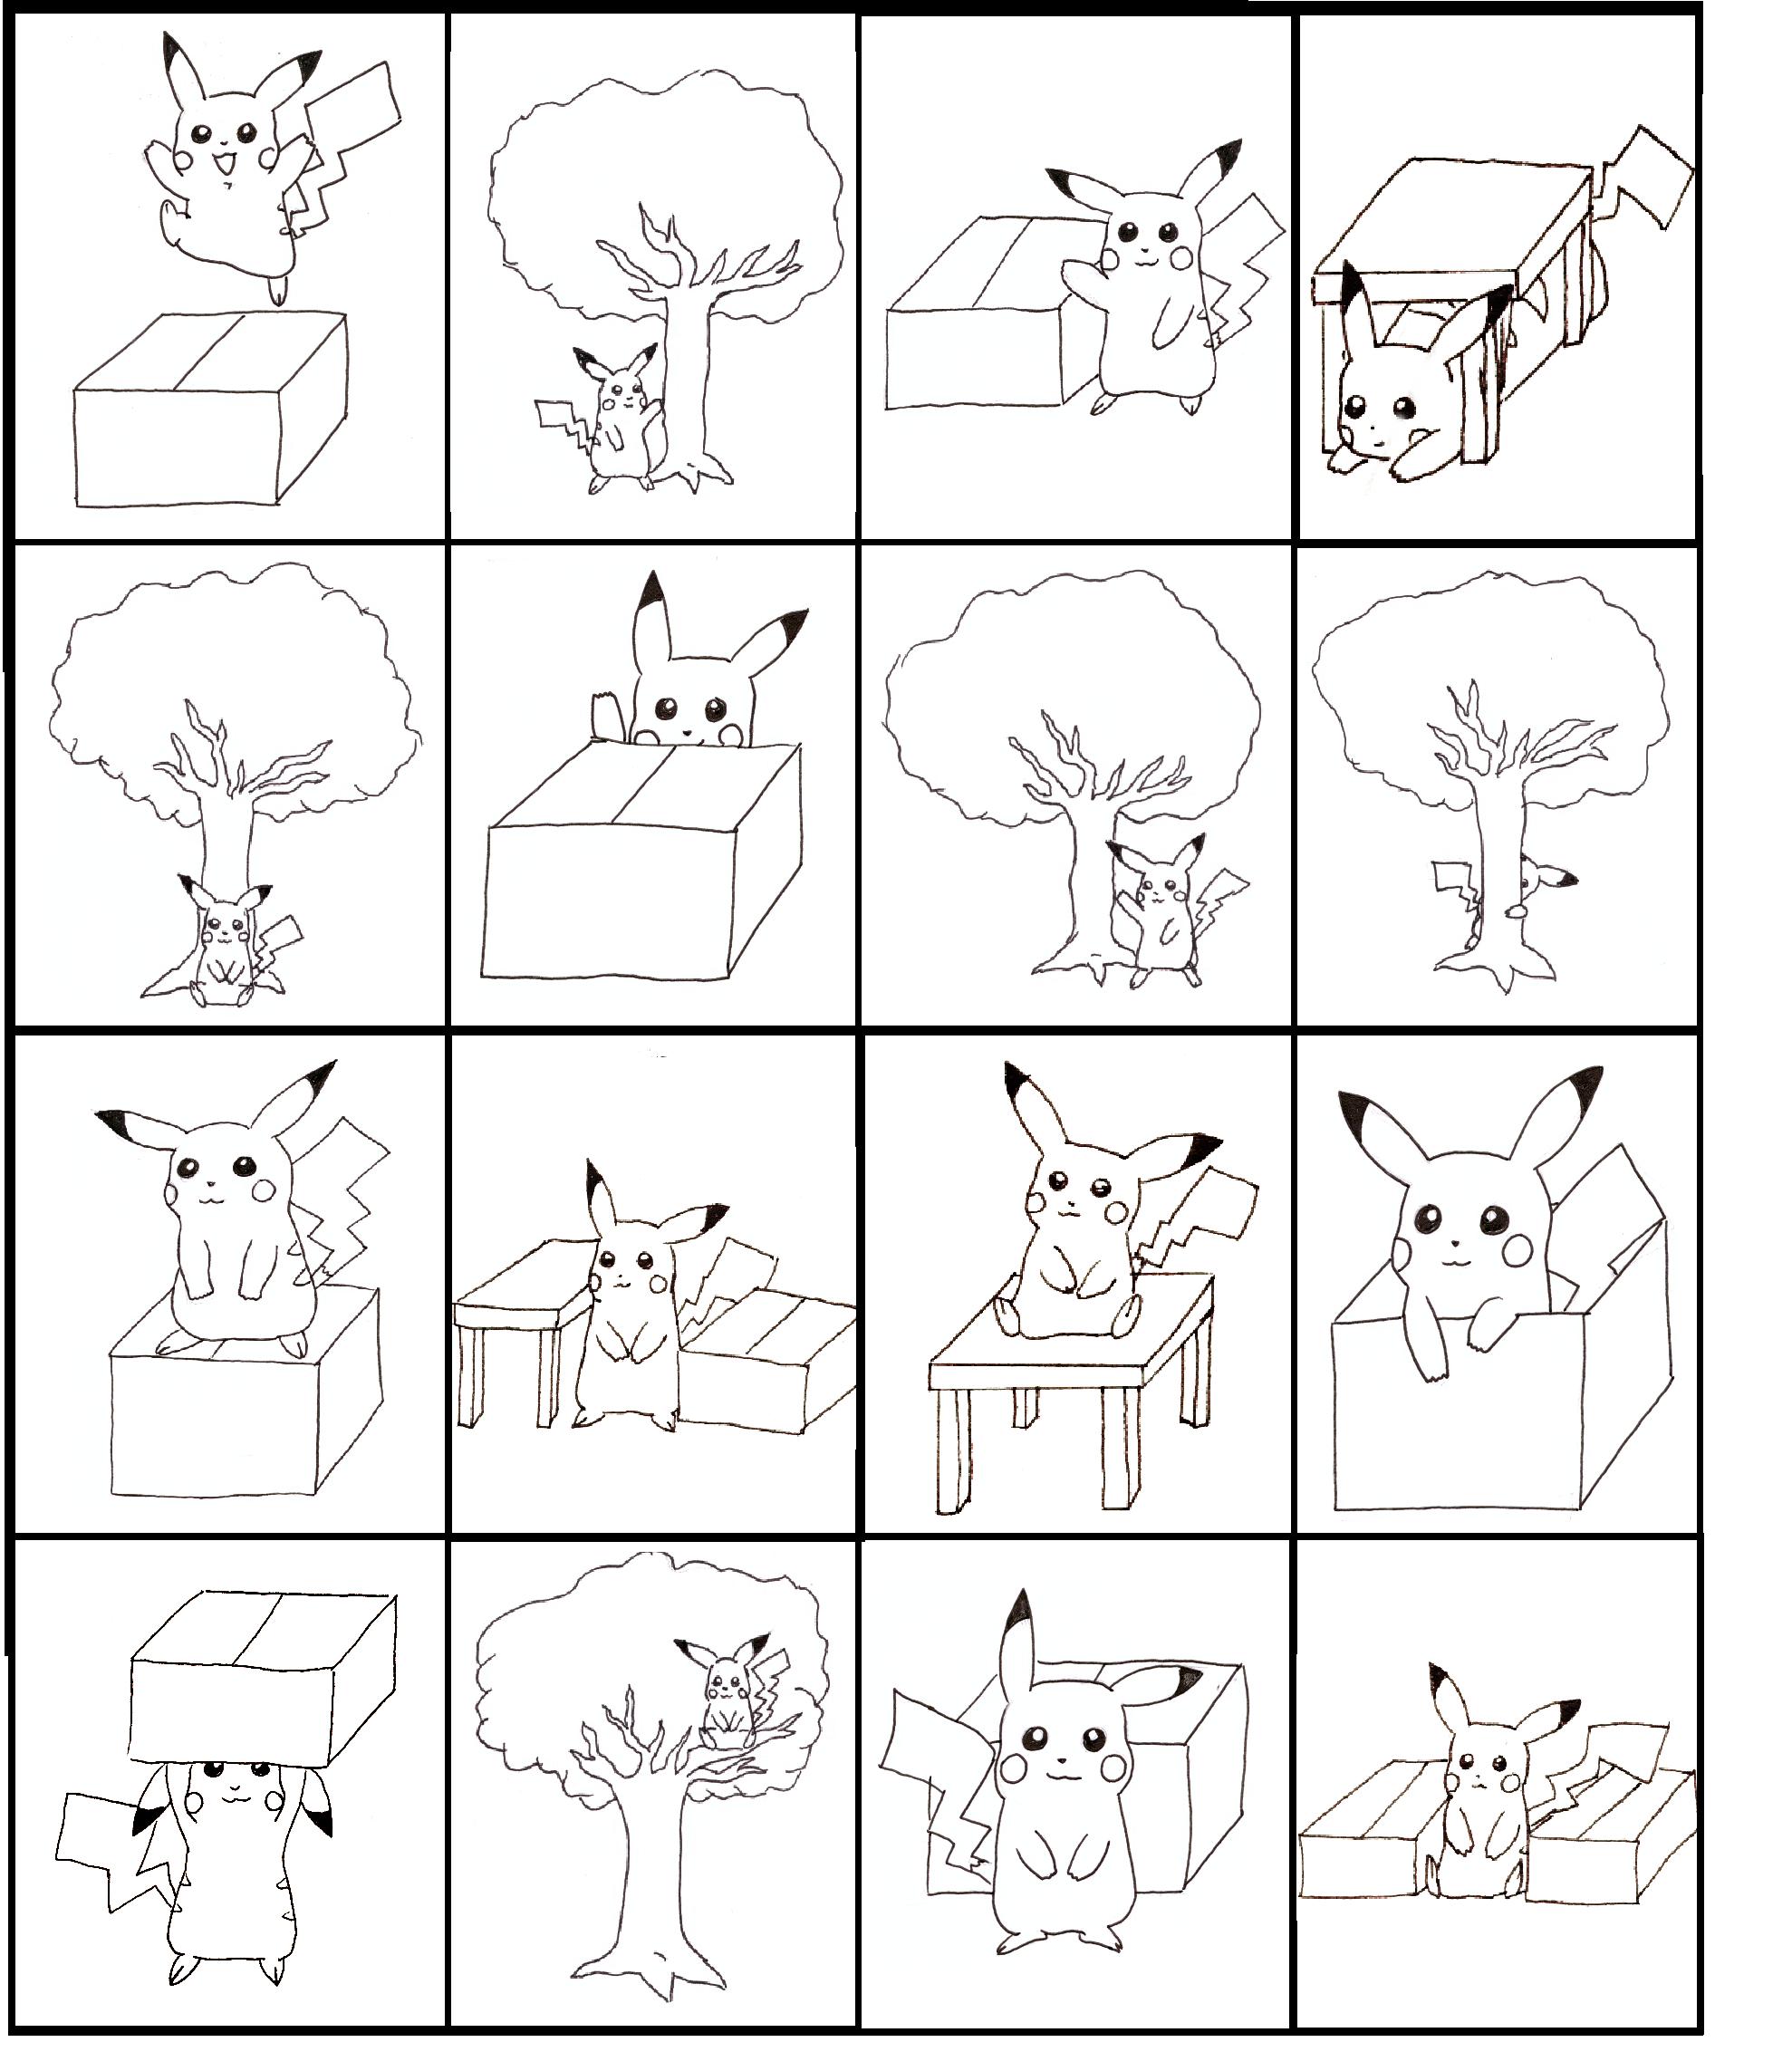 Pikachu Bingo Practicing Prepositions Board 1 Of 4 Made